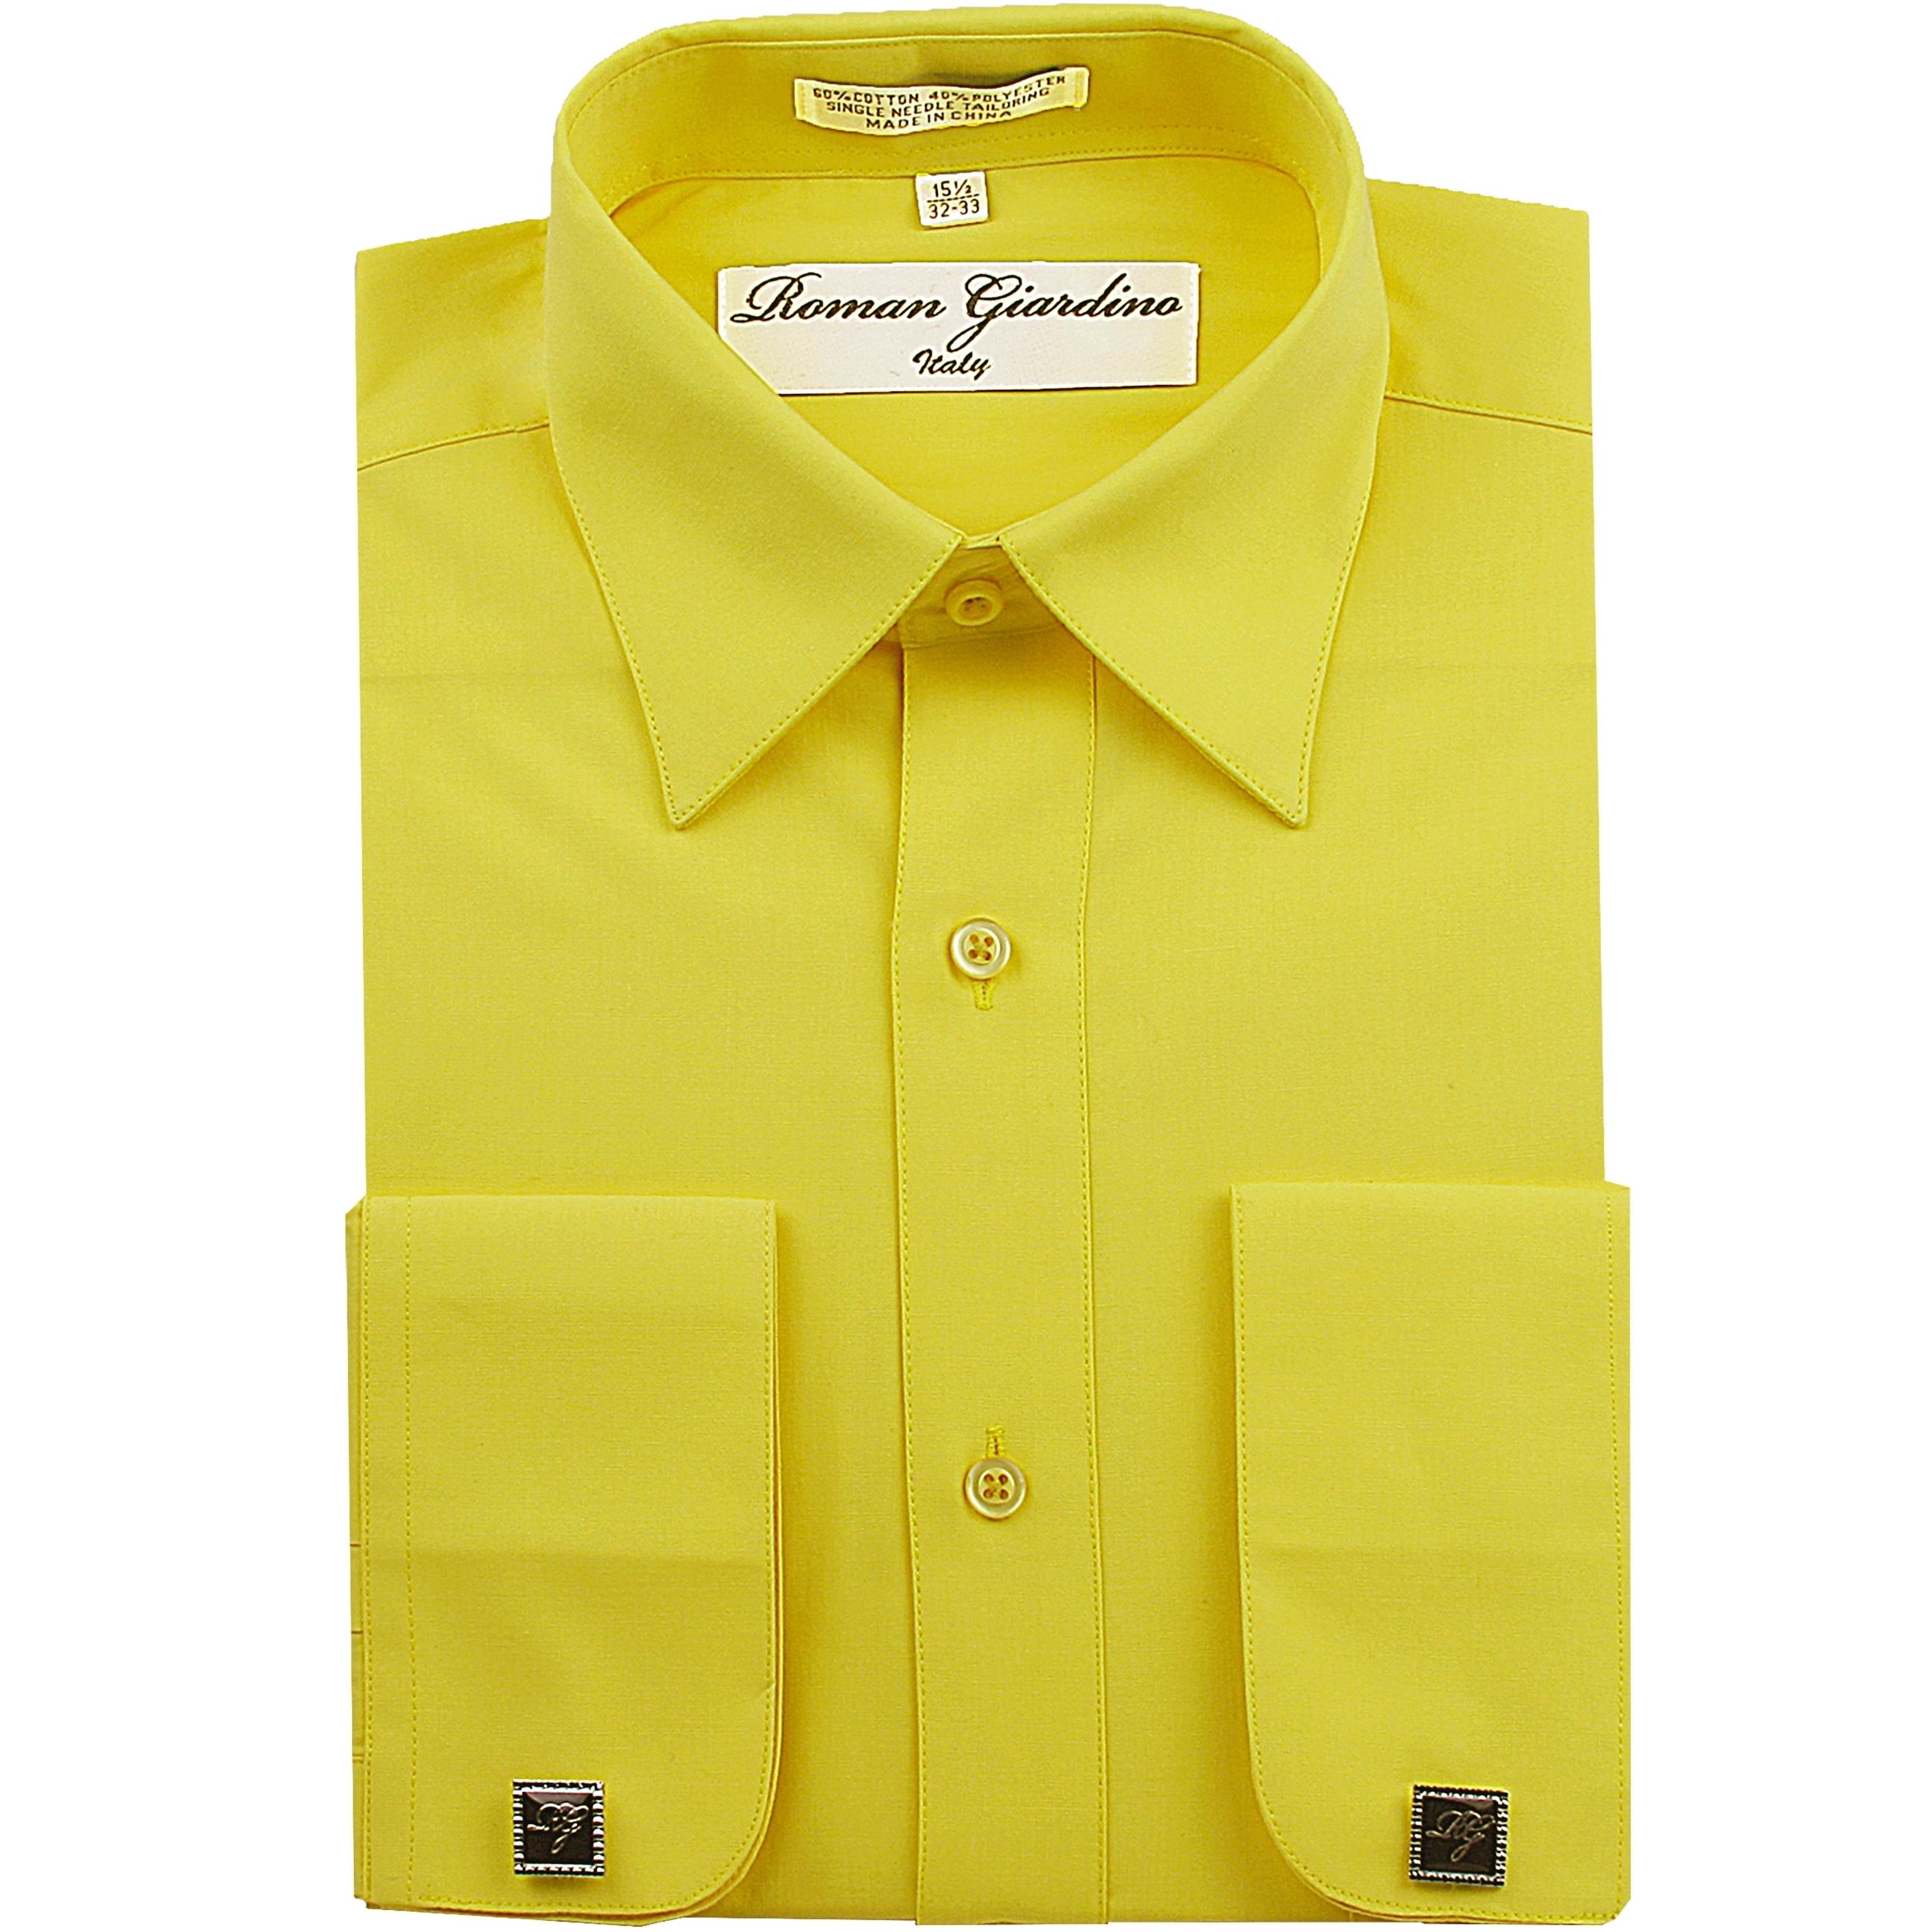 8e80089f81e Mens Dress Shirts That Need Cufflinks - BCD Tofu House